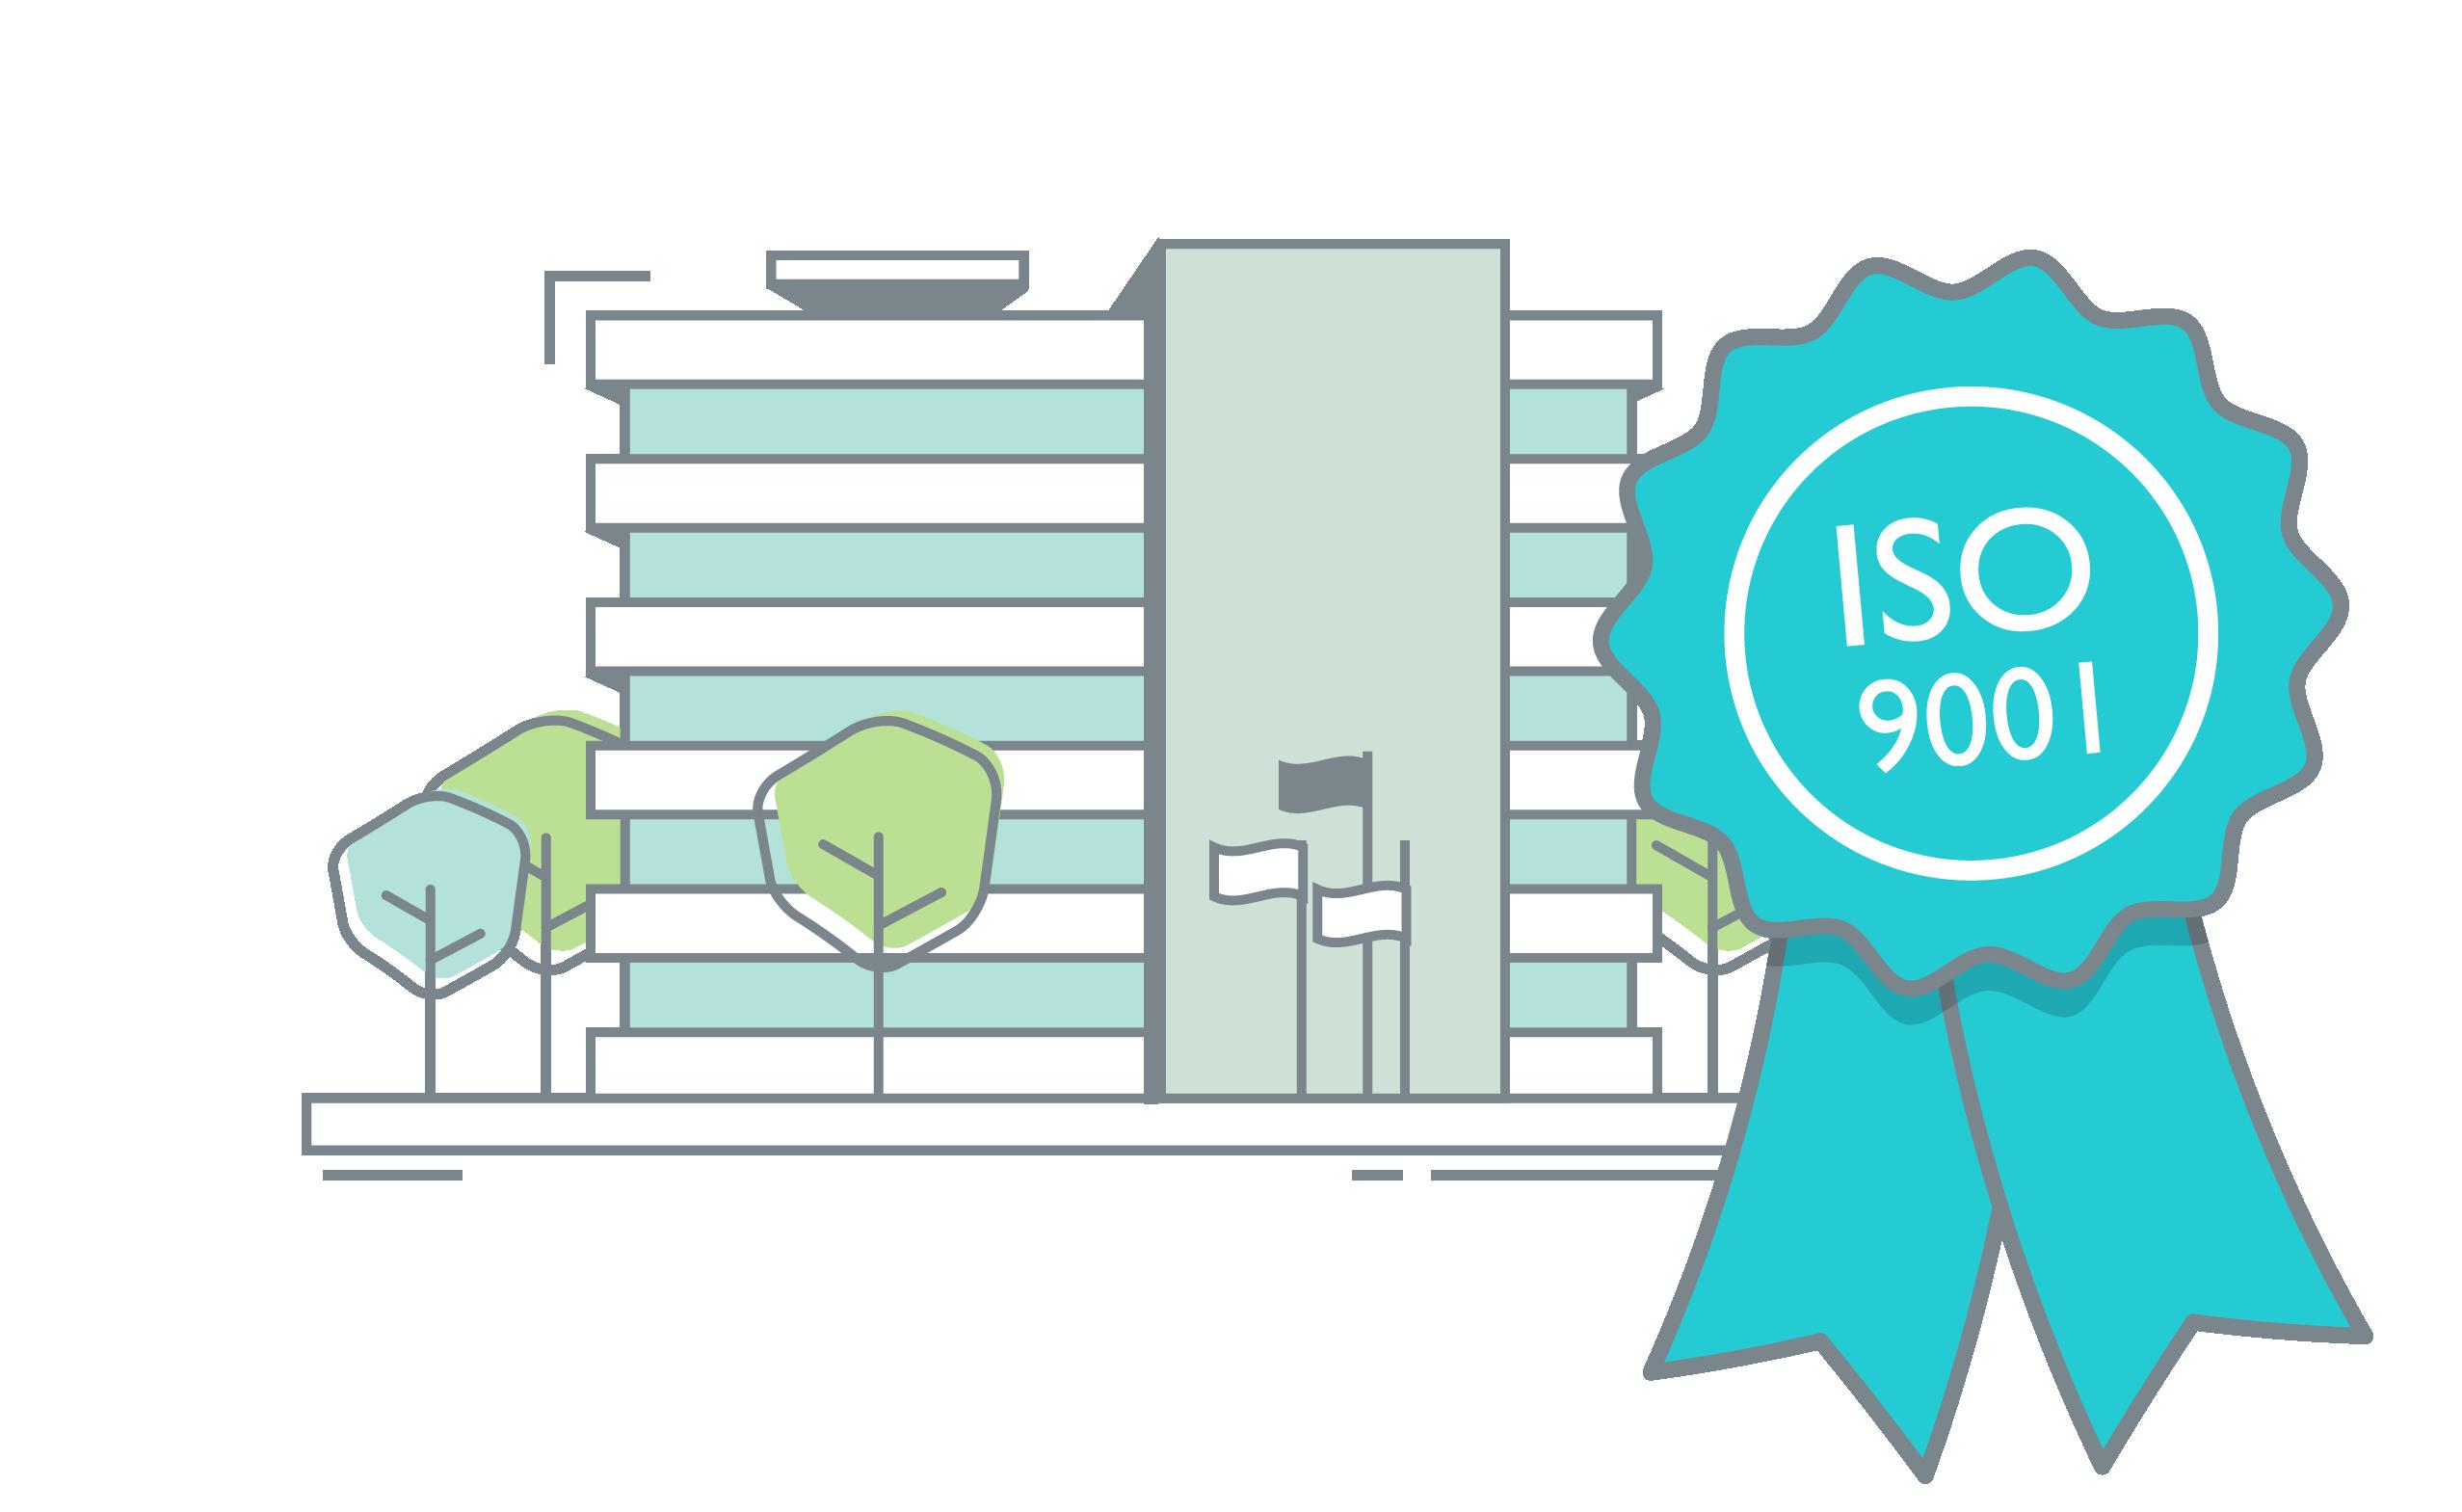 iso9001 01 - خدمات استشارات نظم الجودة